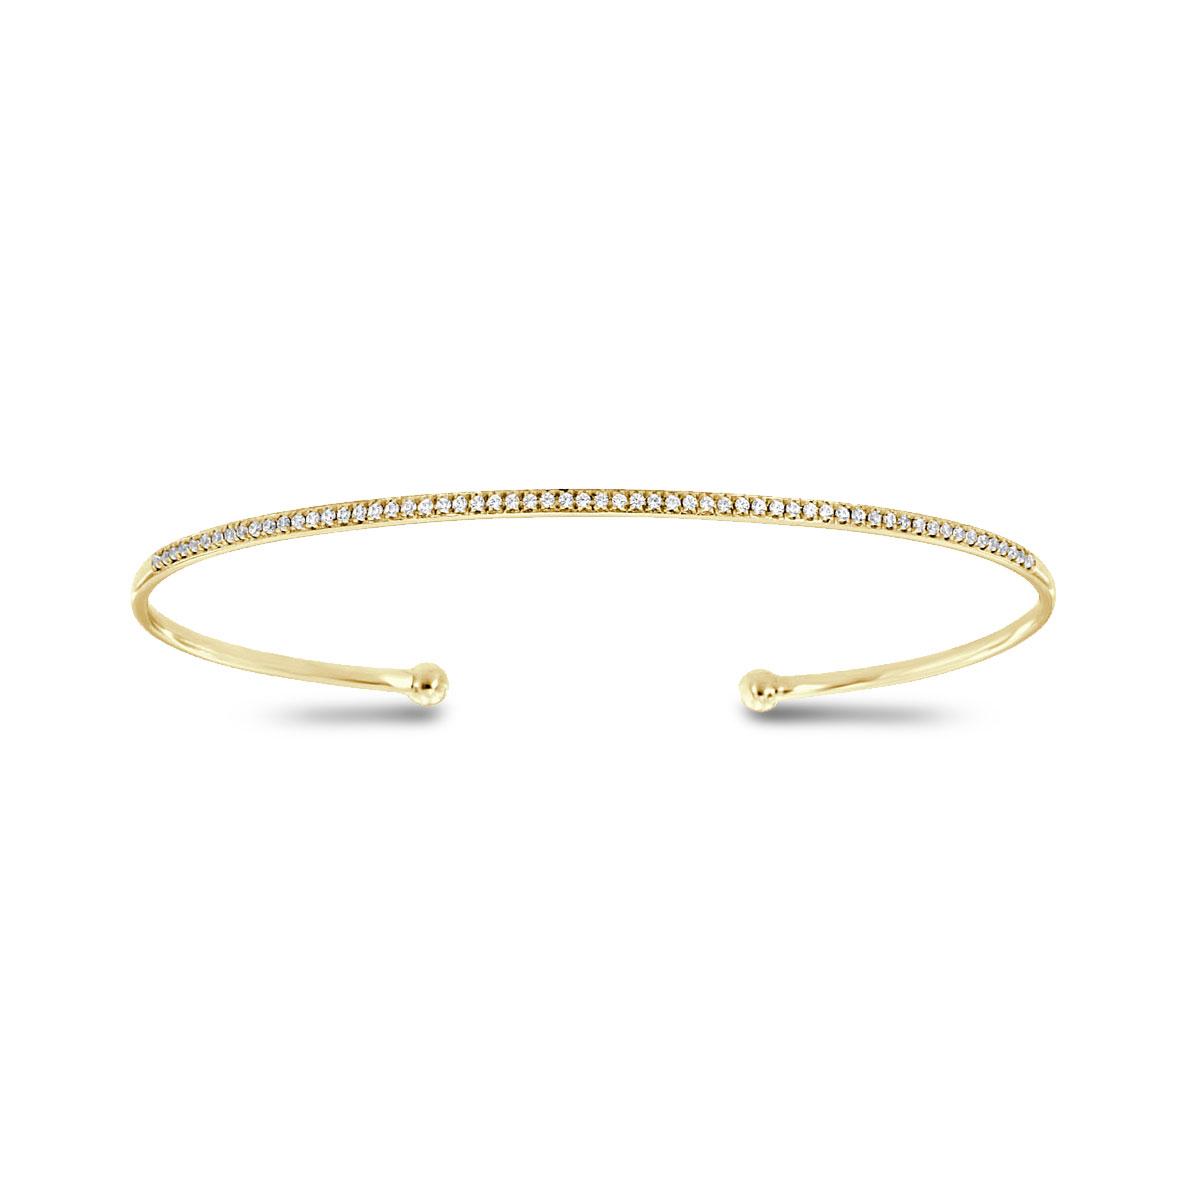 14K Yellow Gold Petite Flex Cuff Diamond Bangle Bracelet (1/5 ct. tw)